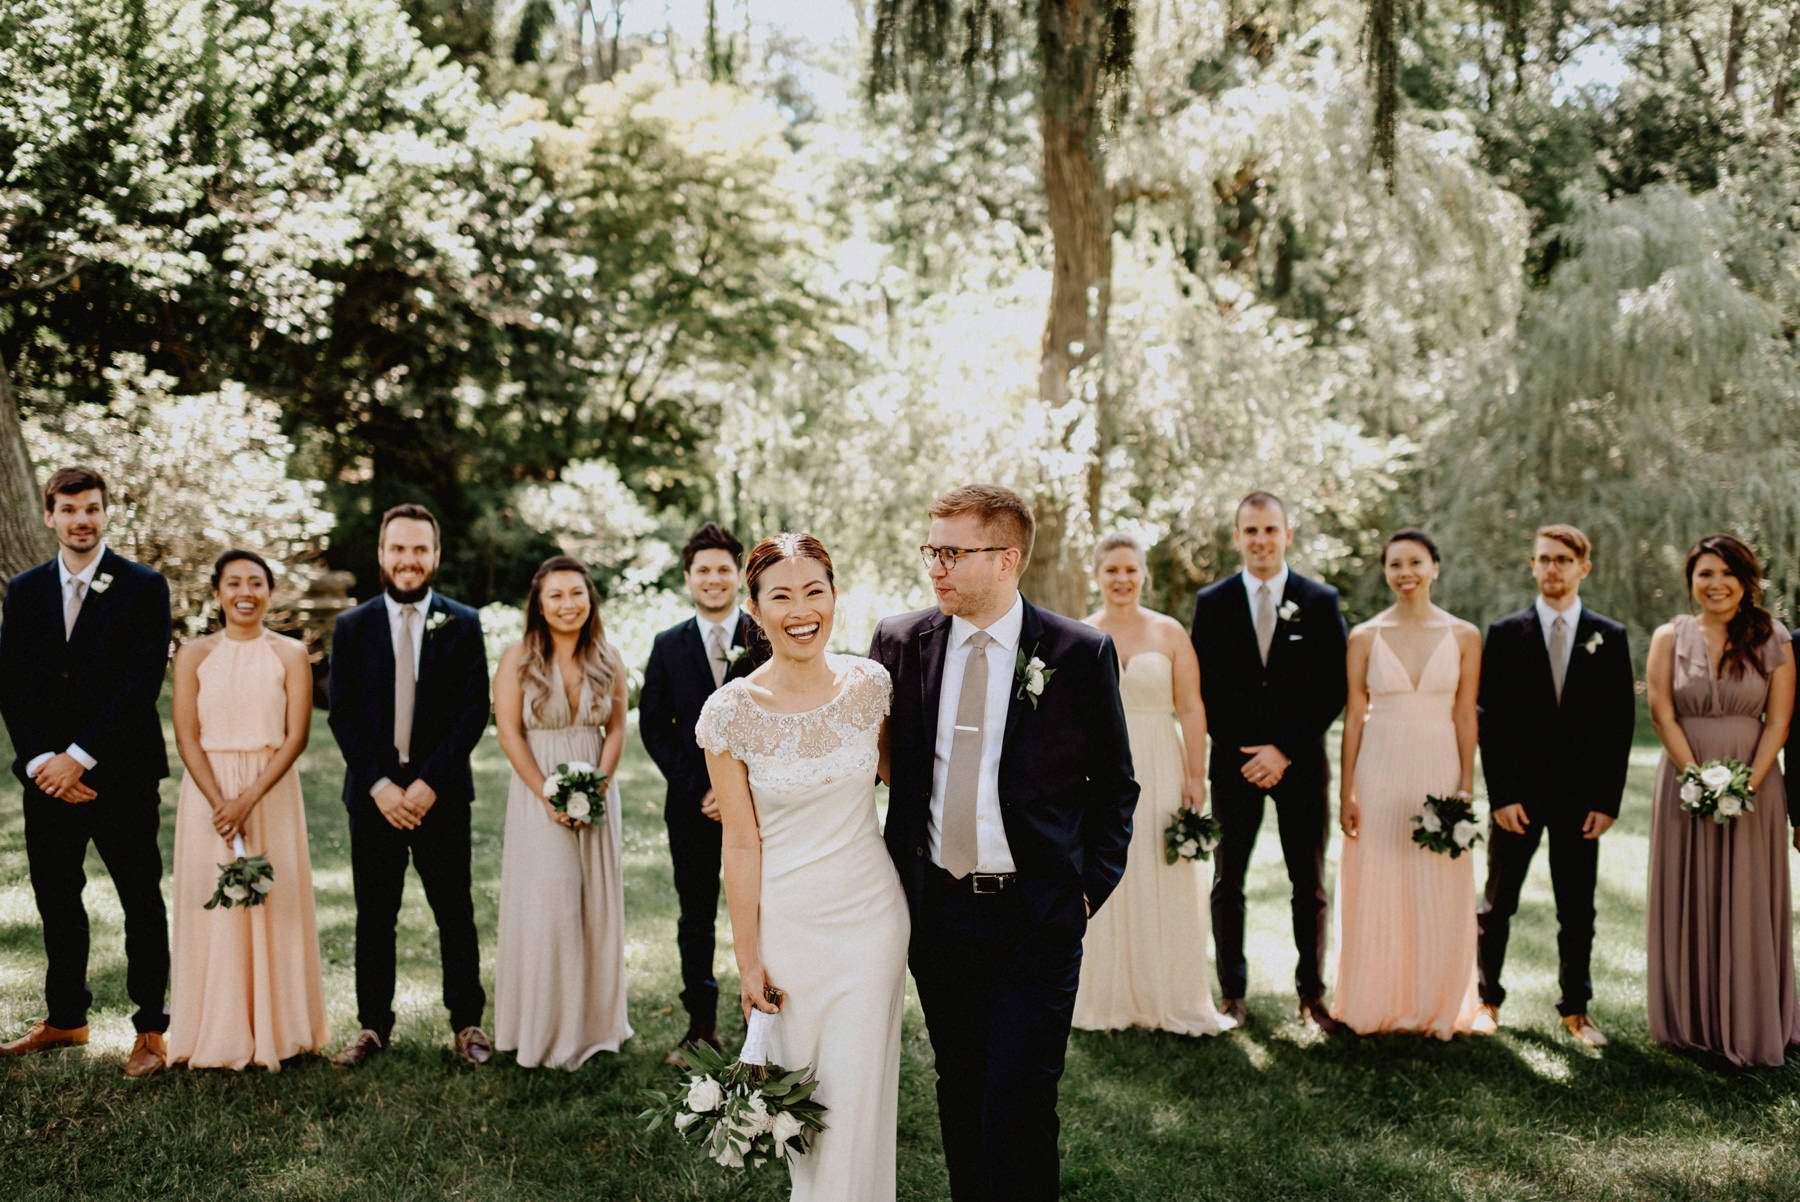 Appleford-estate-wedding-53.jpg